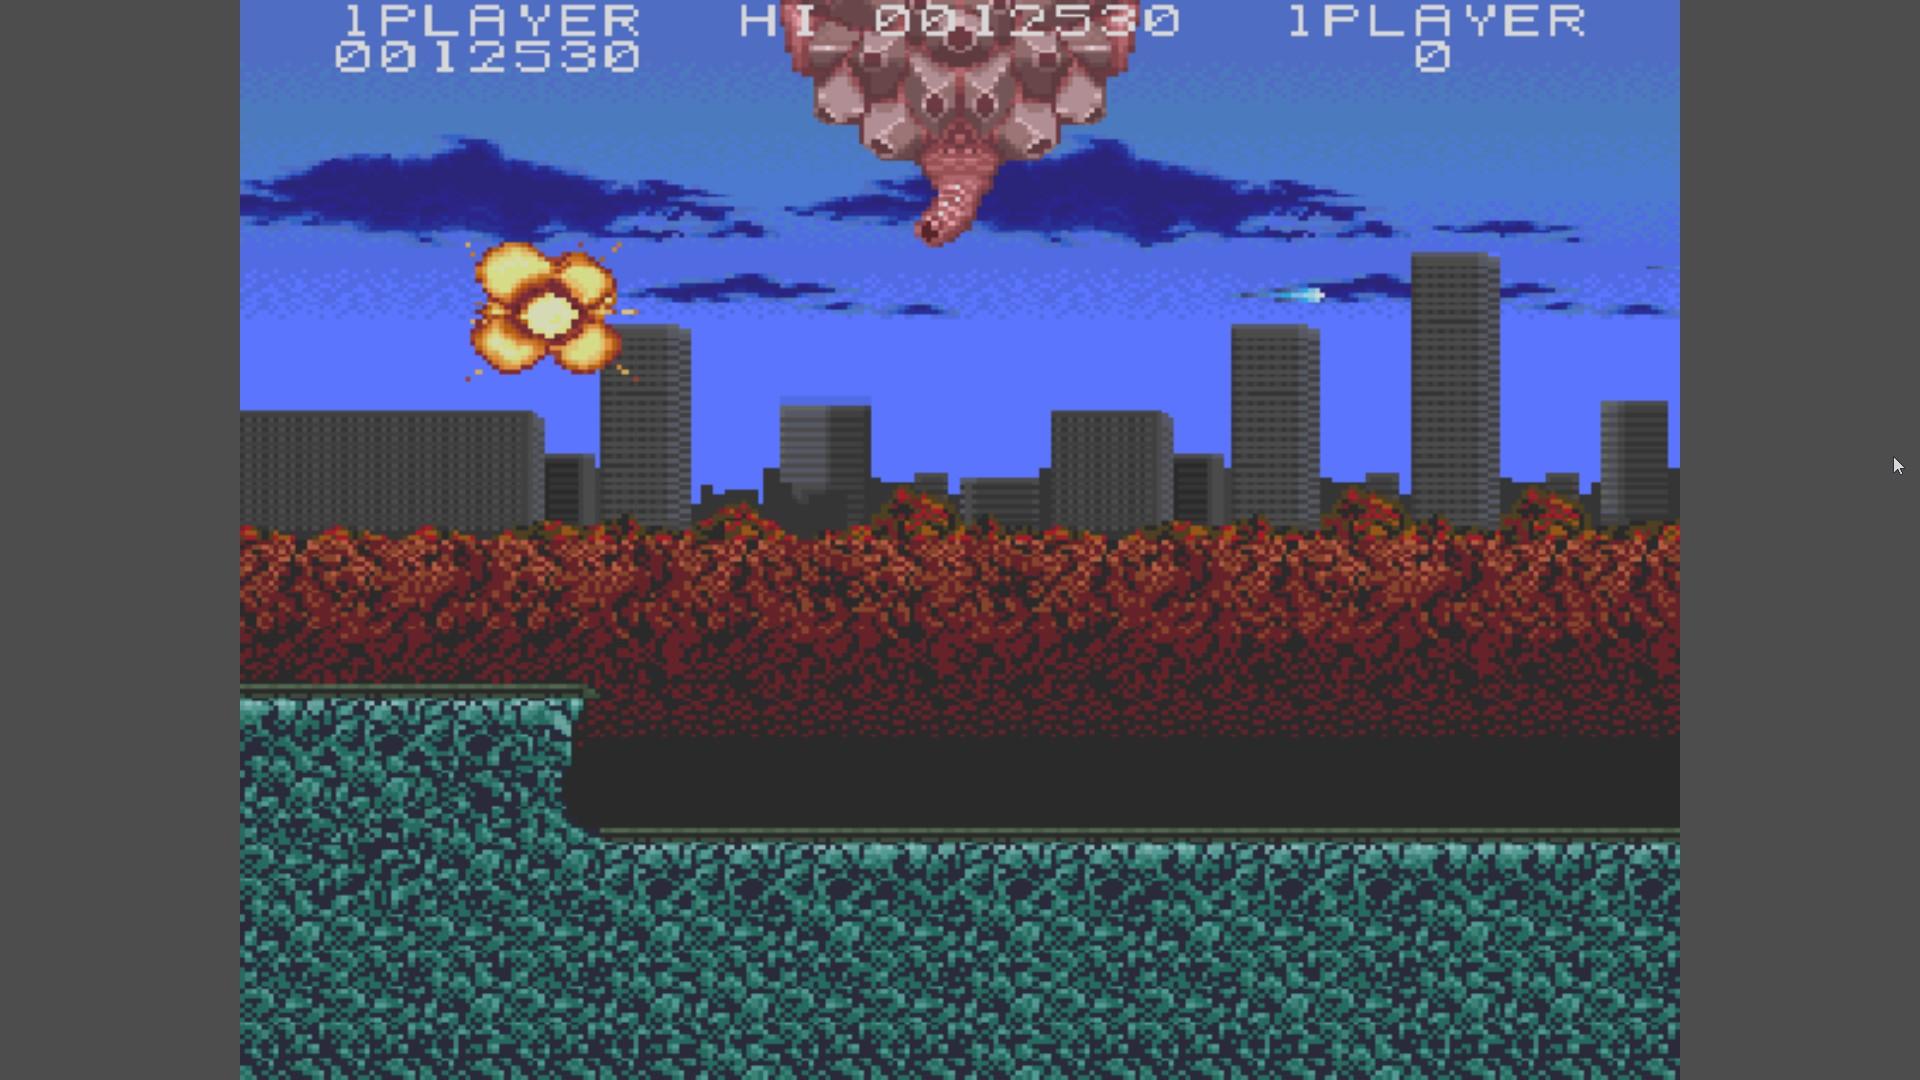 Act-Fancer Cybernetick Hyper Weapon [actfancr] 12,530 points